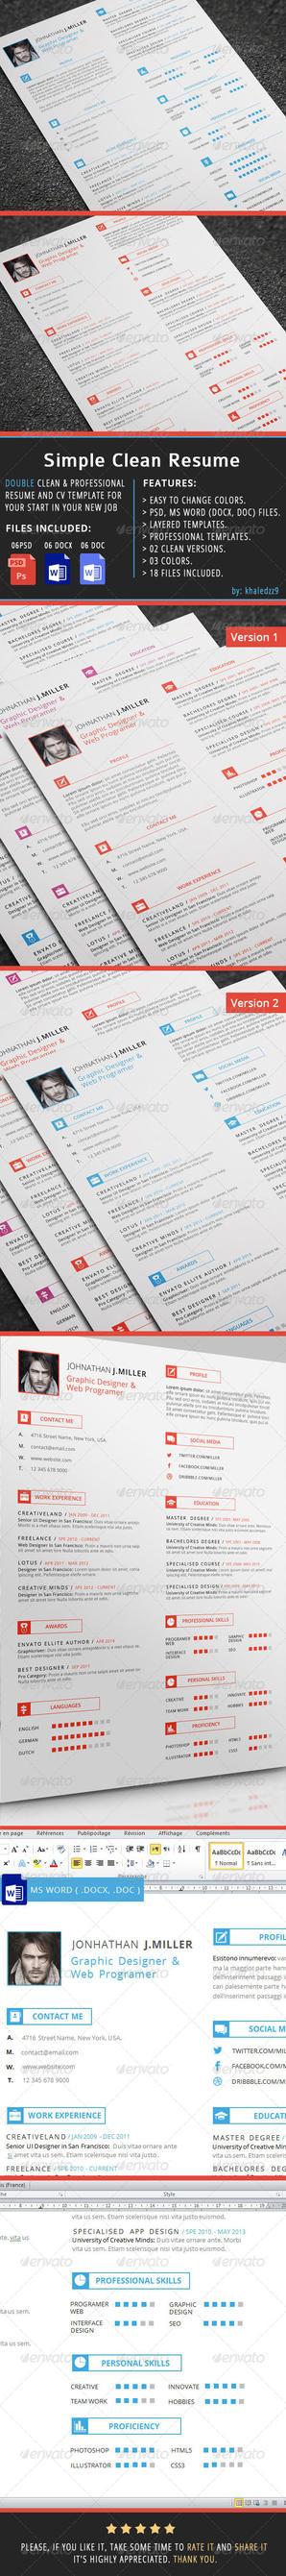 Simple Clean Resume by khaledzz9